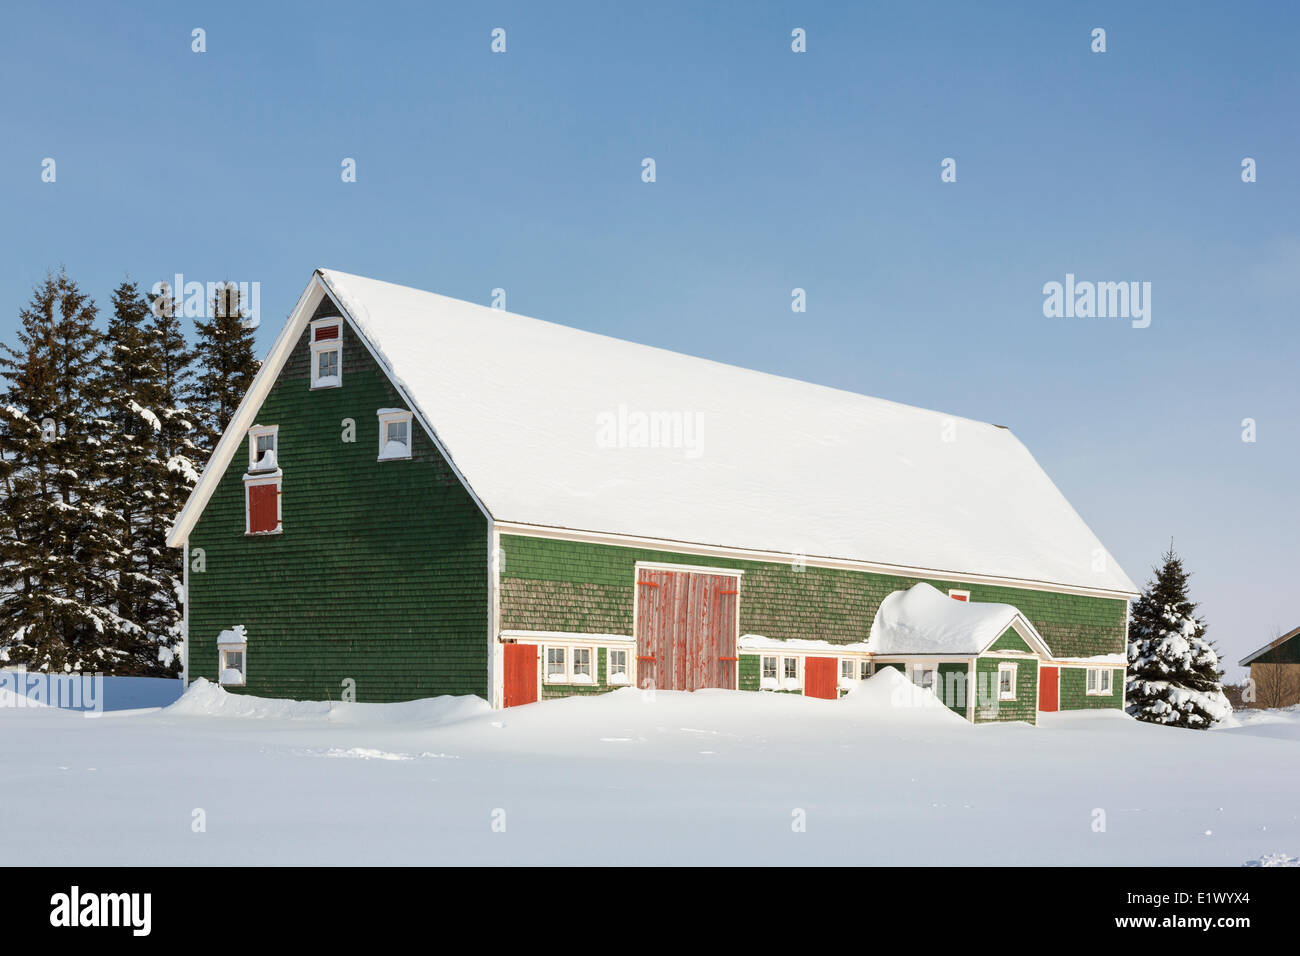 Farm, Burlington, Prince Edward Island, Canada - Stock Image